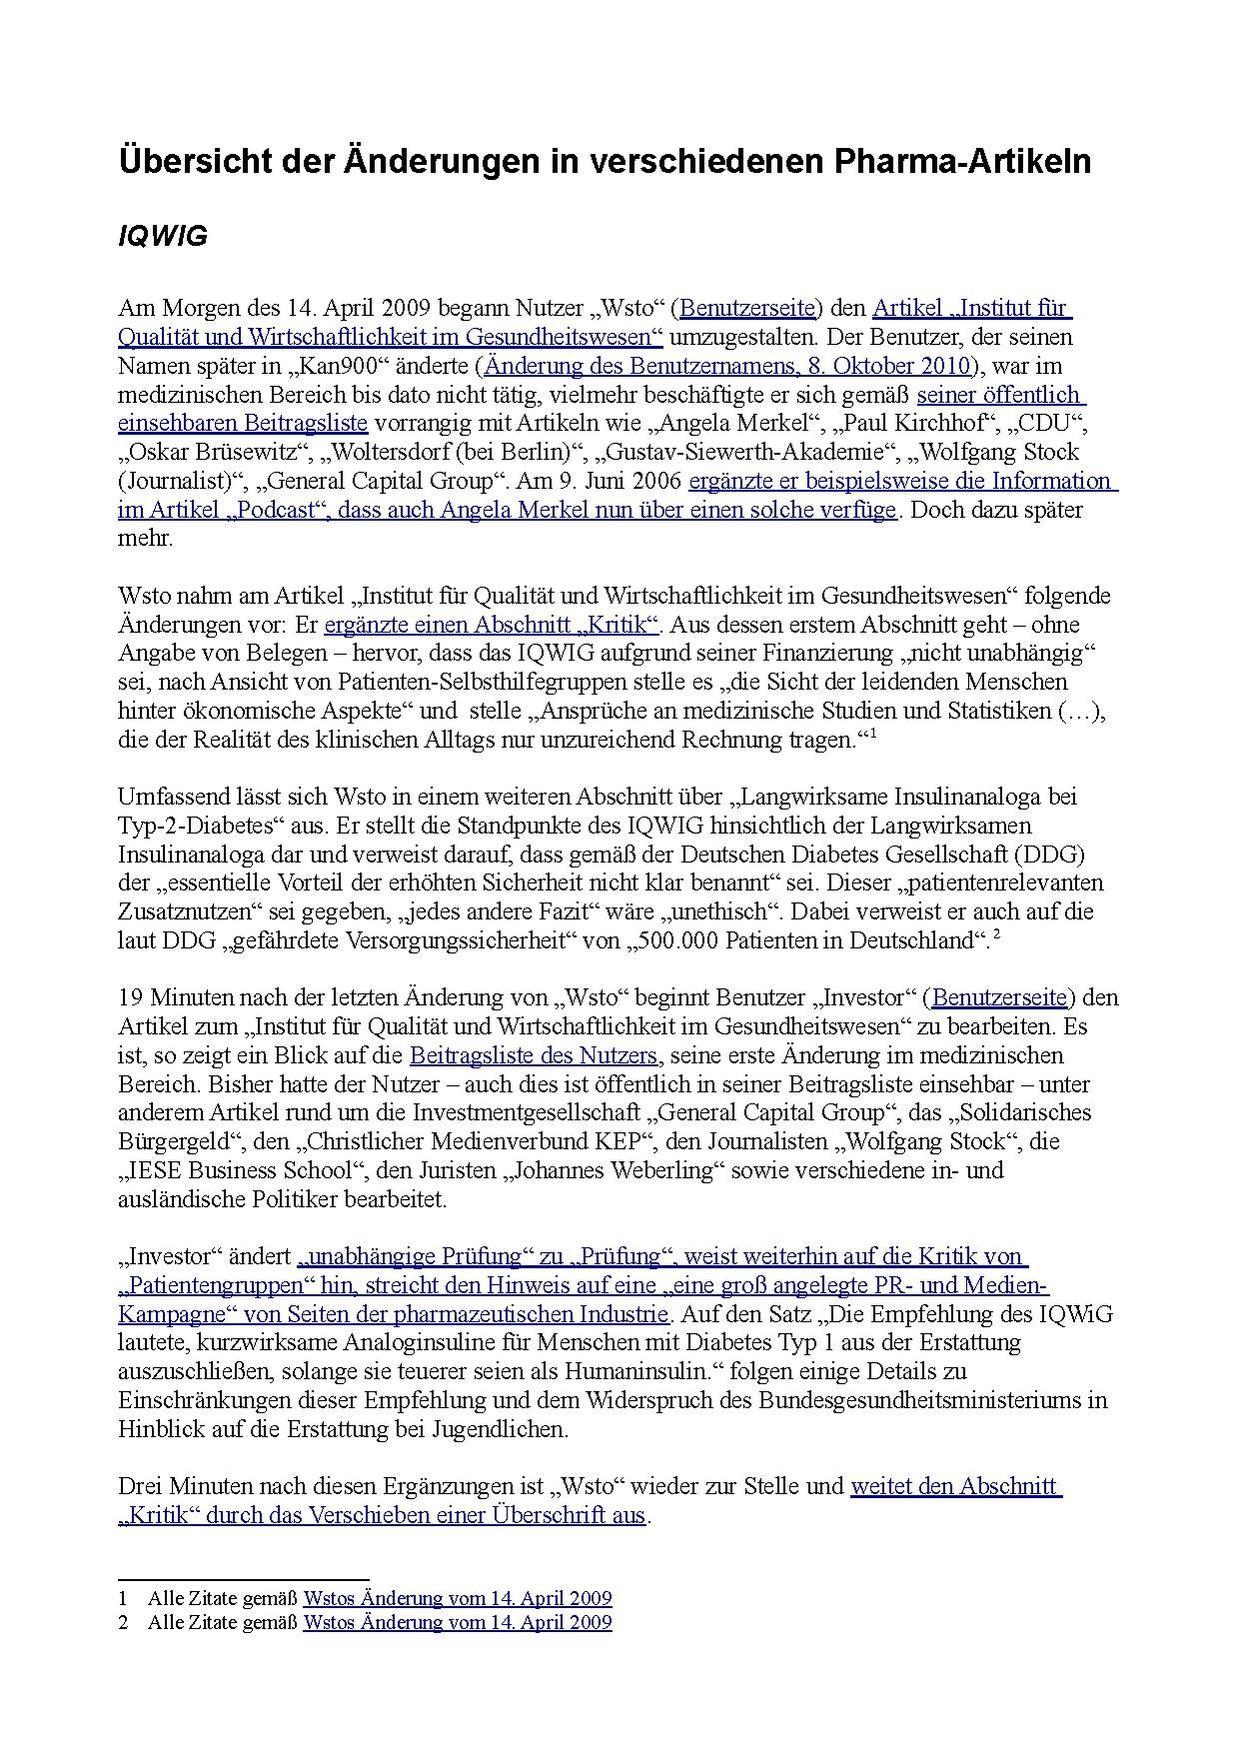 File:IQWIGundCo.pdf - Wikimedia Commons